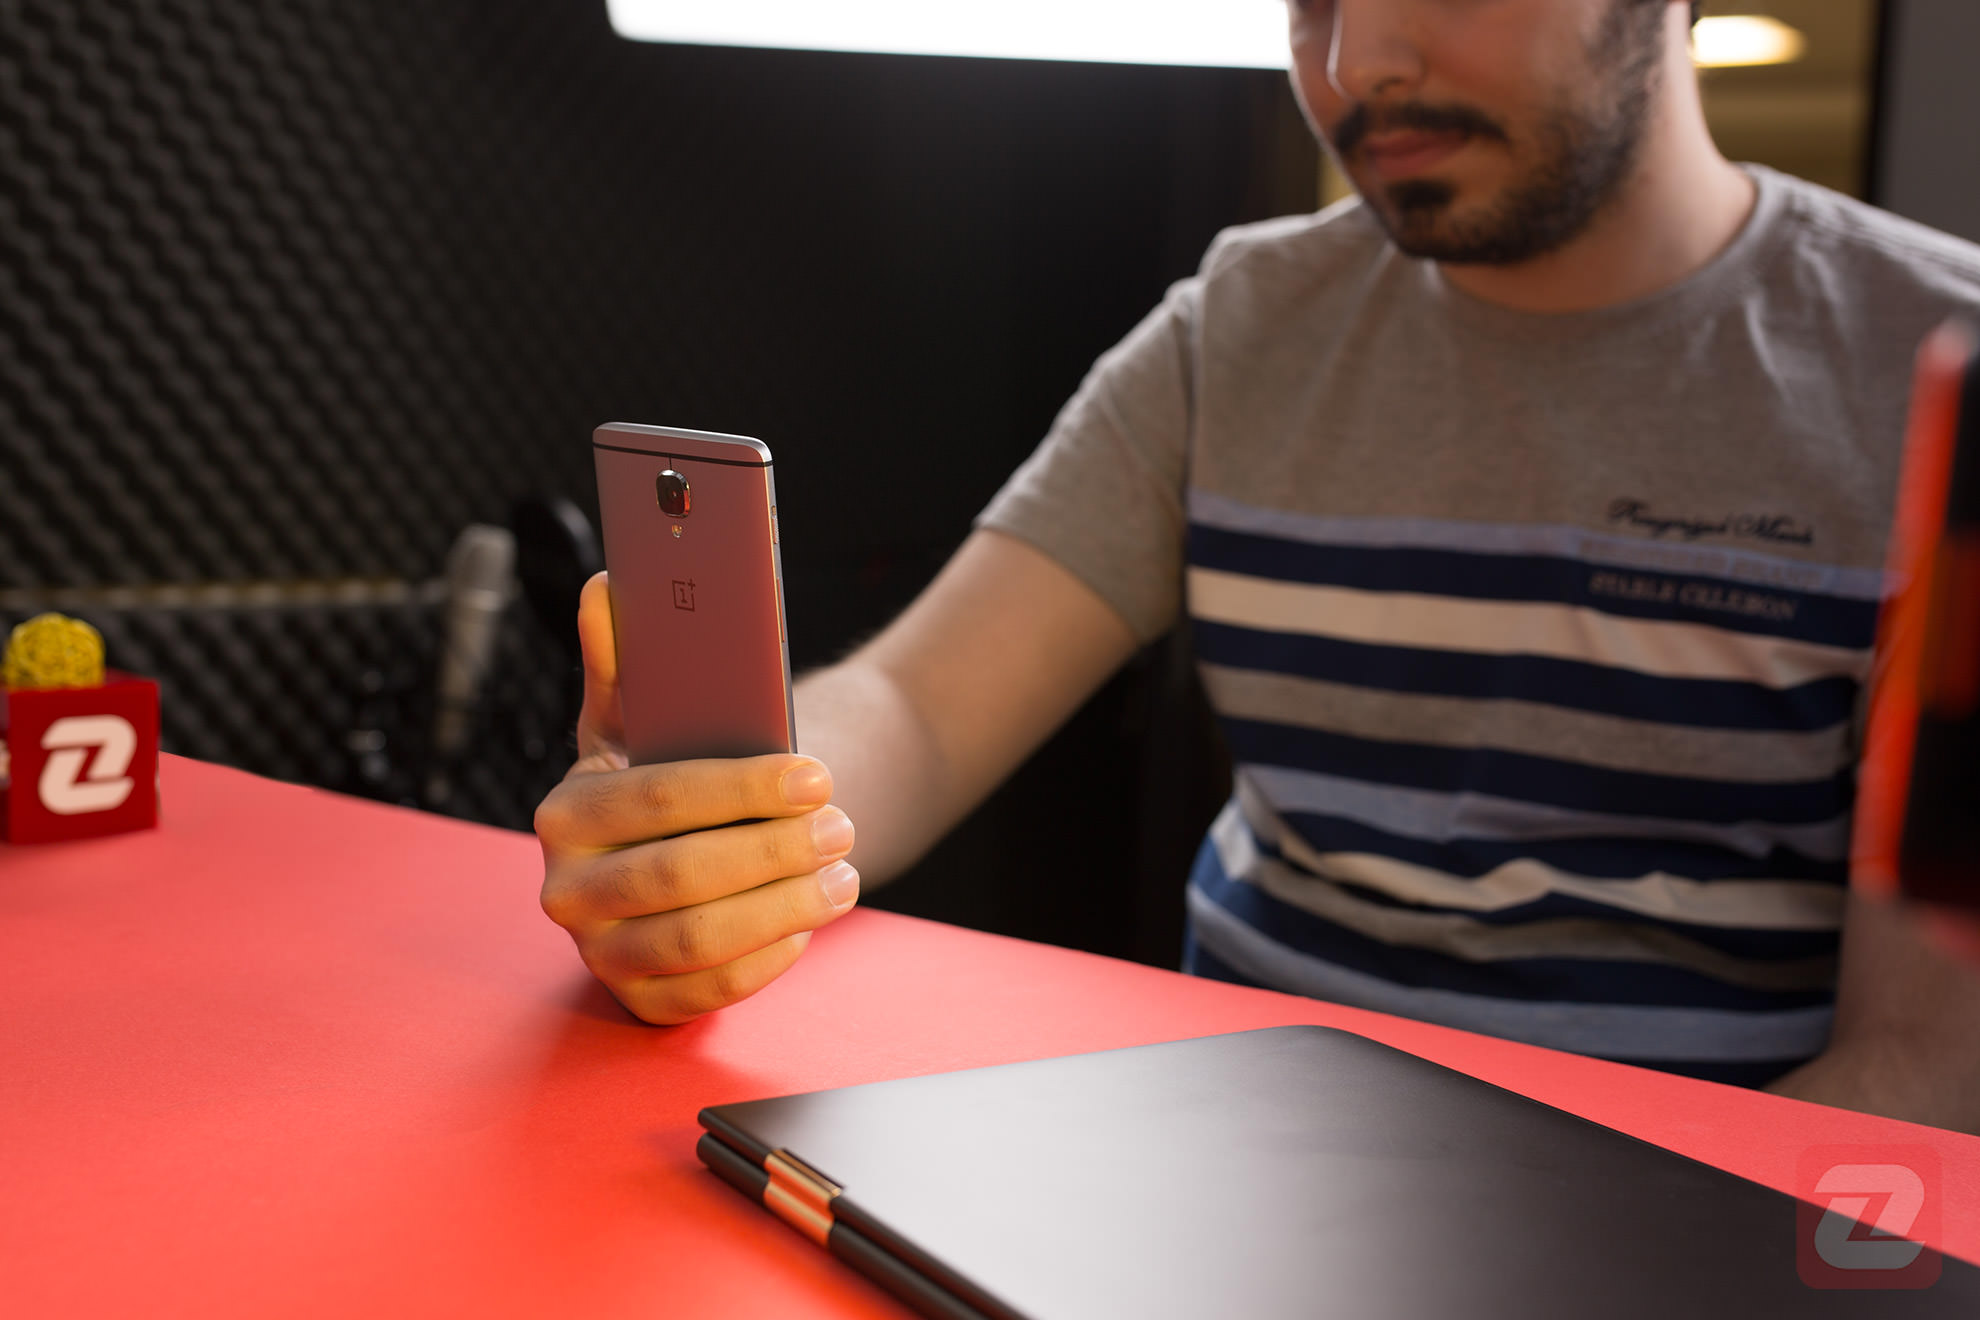 OnePlus 3- Performance